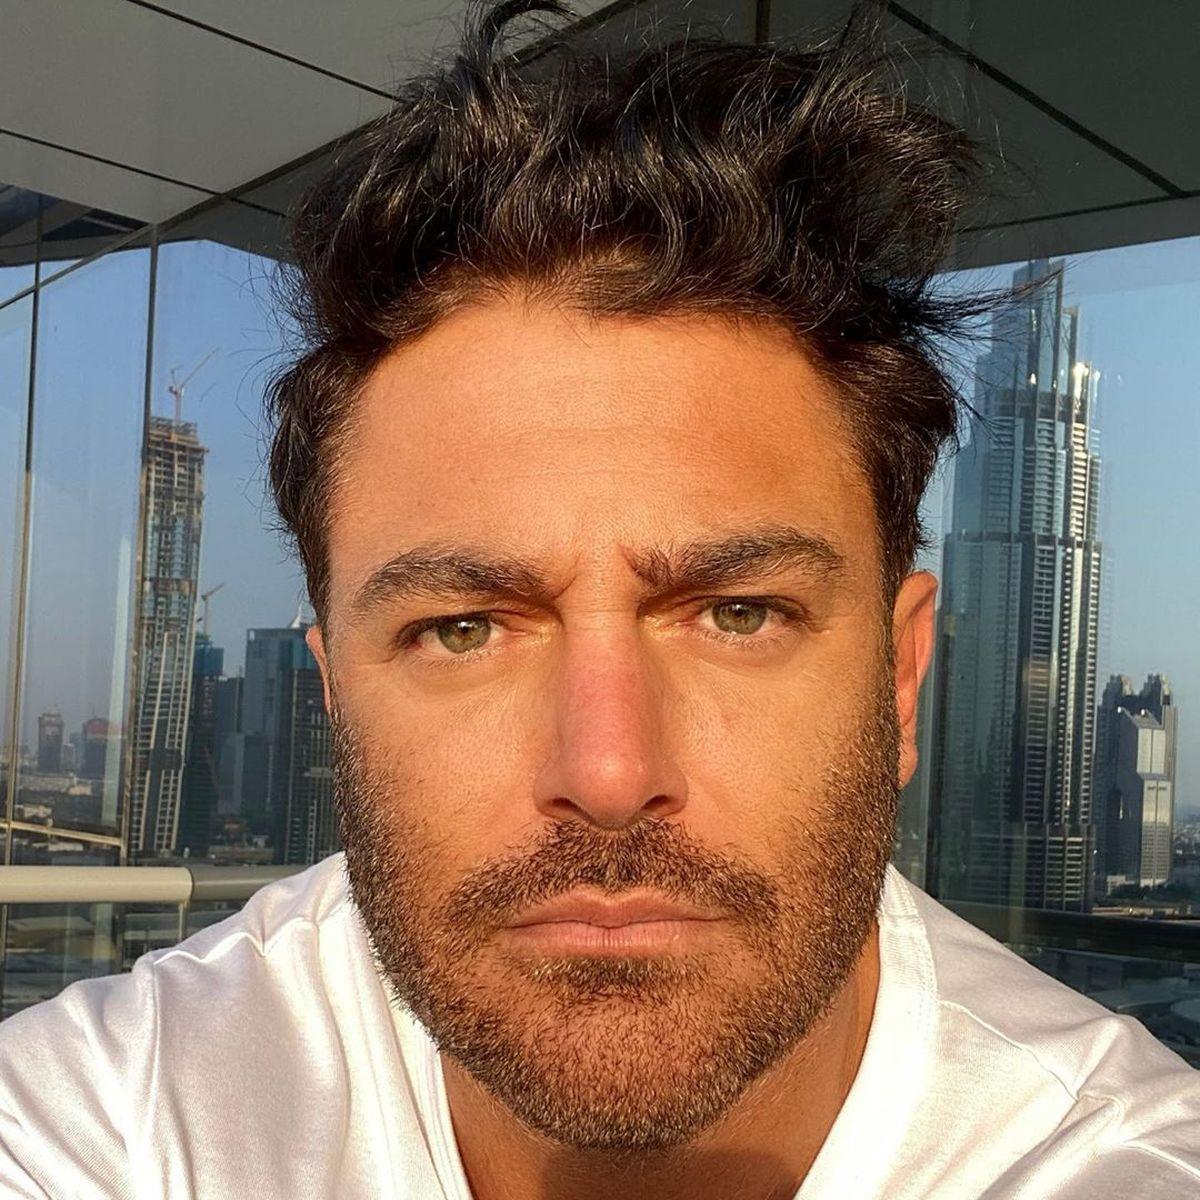 چهره متفکر محمدرضا گلزار + عکس